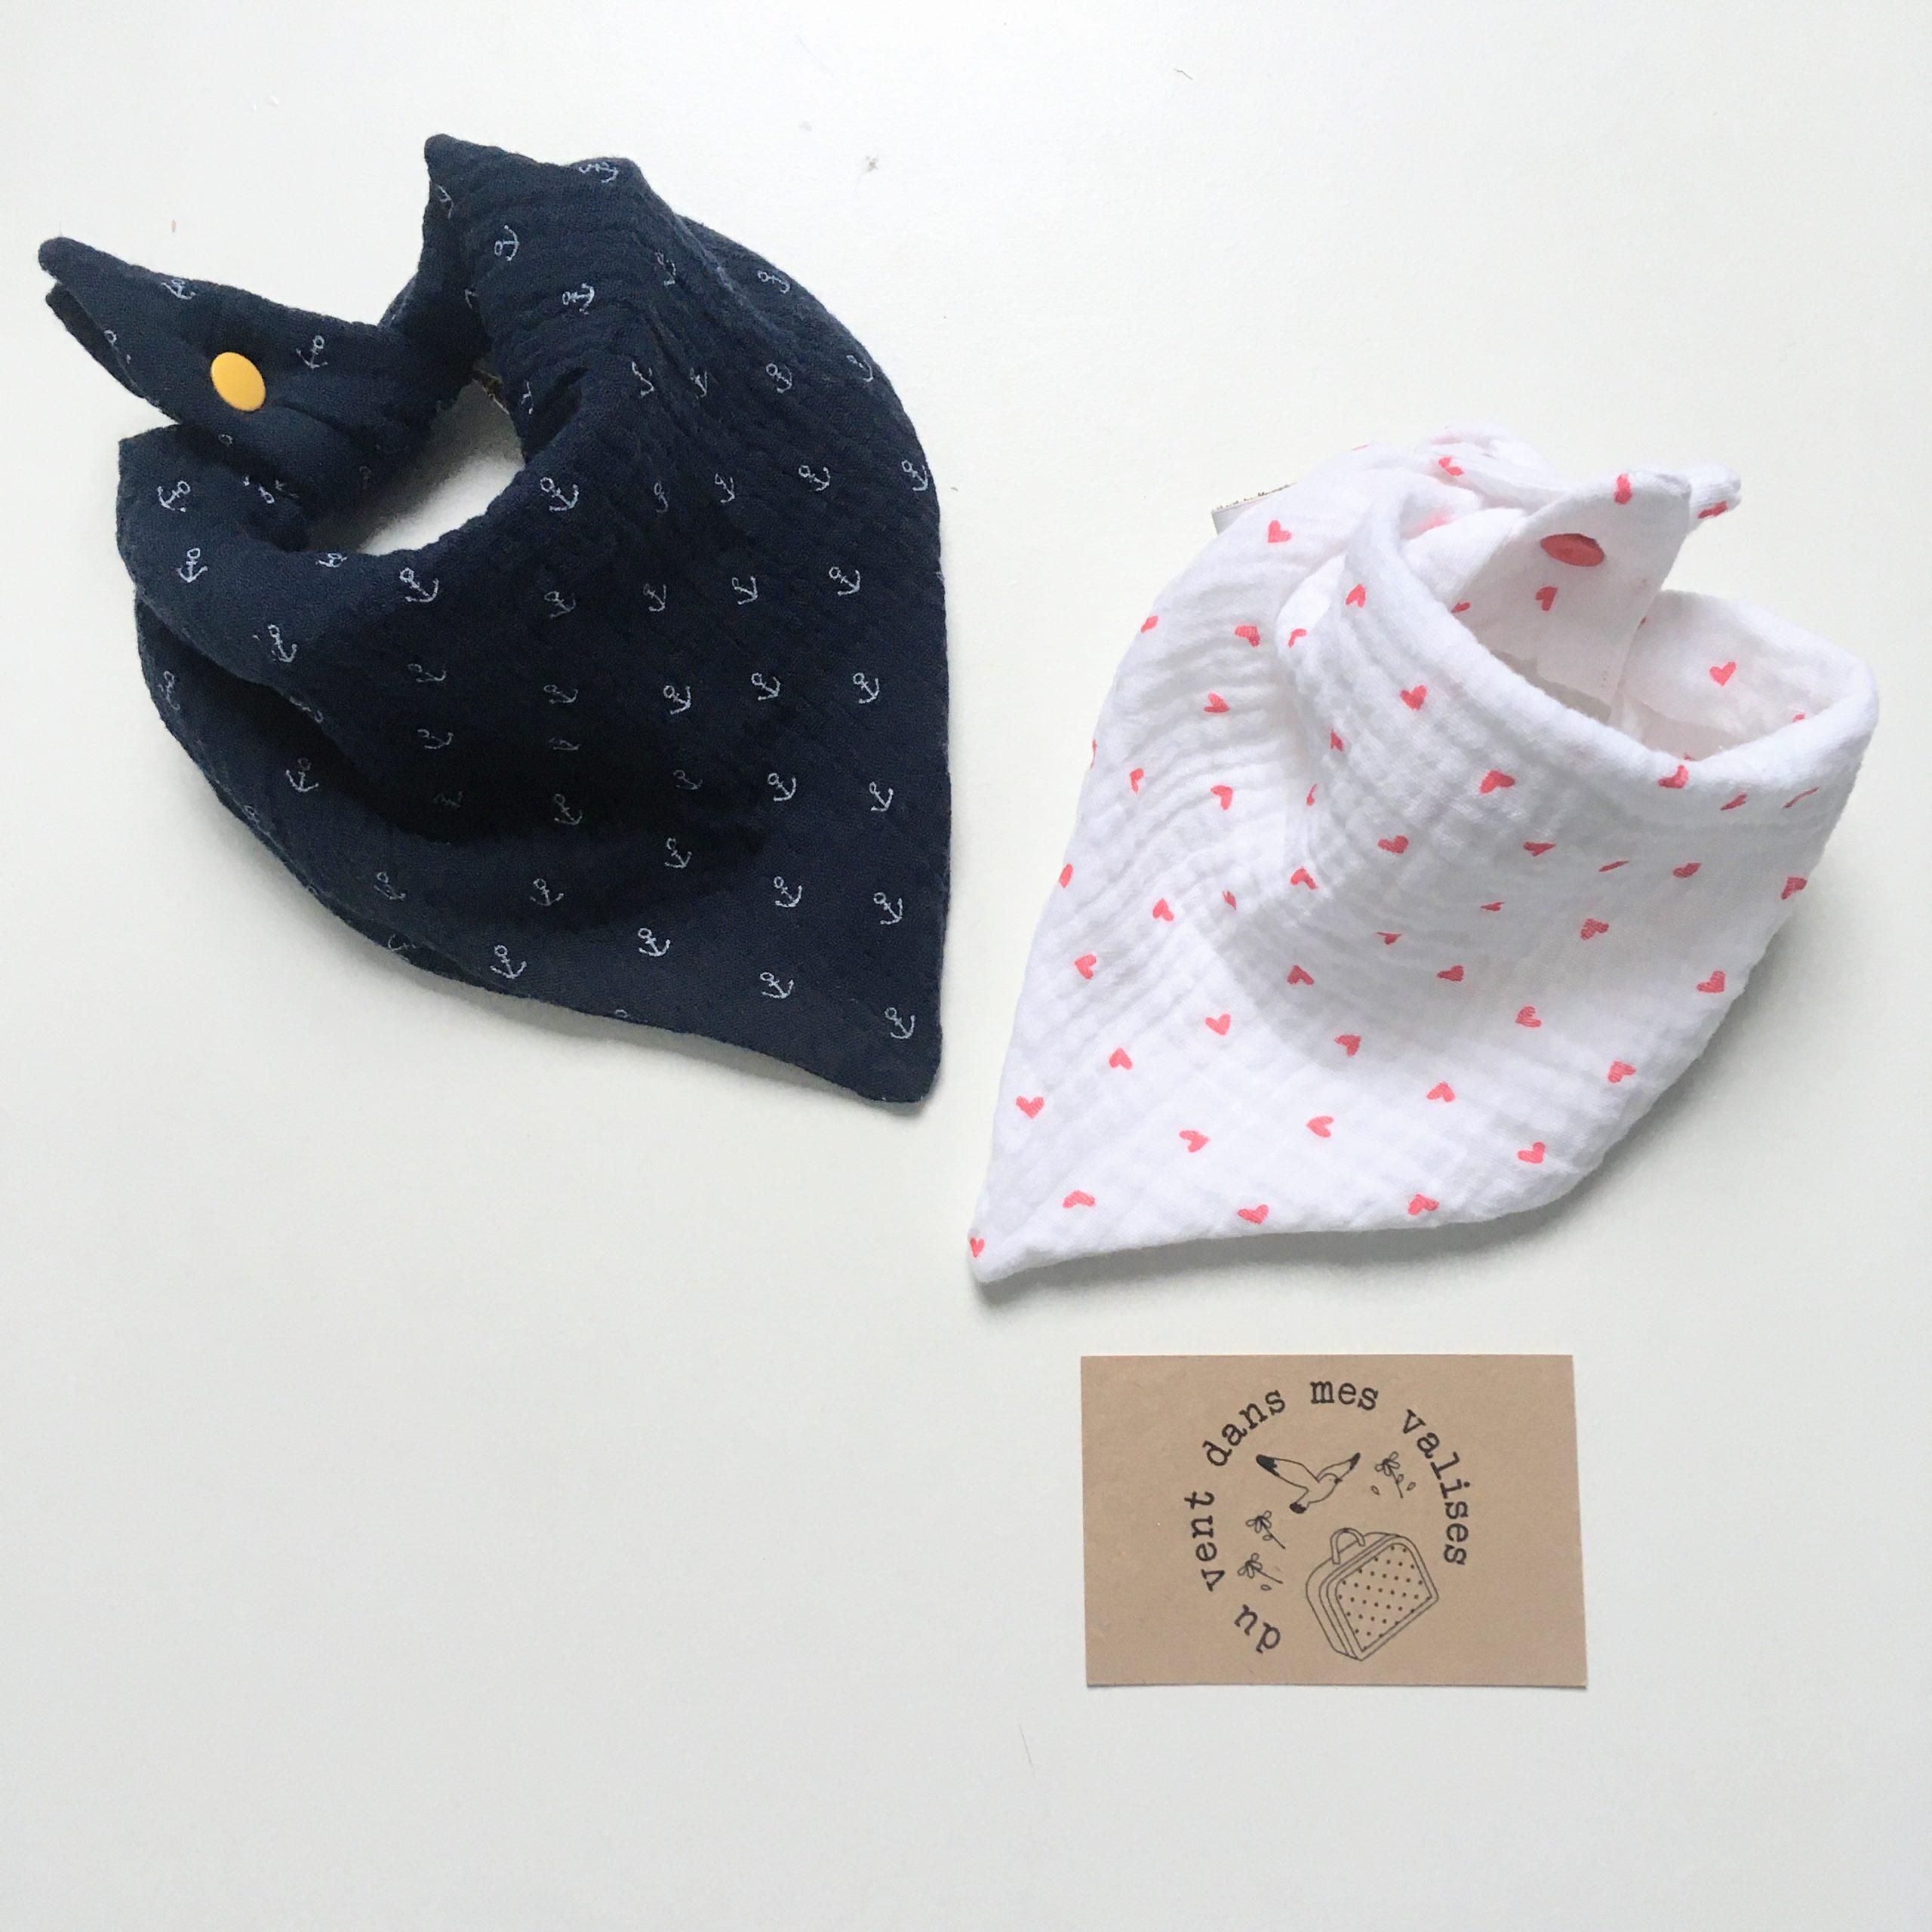 du vent dans mes valises - bavoir foulard bandana double gaze petits coeurs made in France